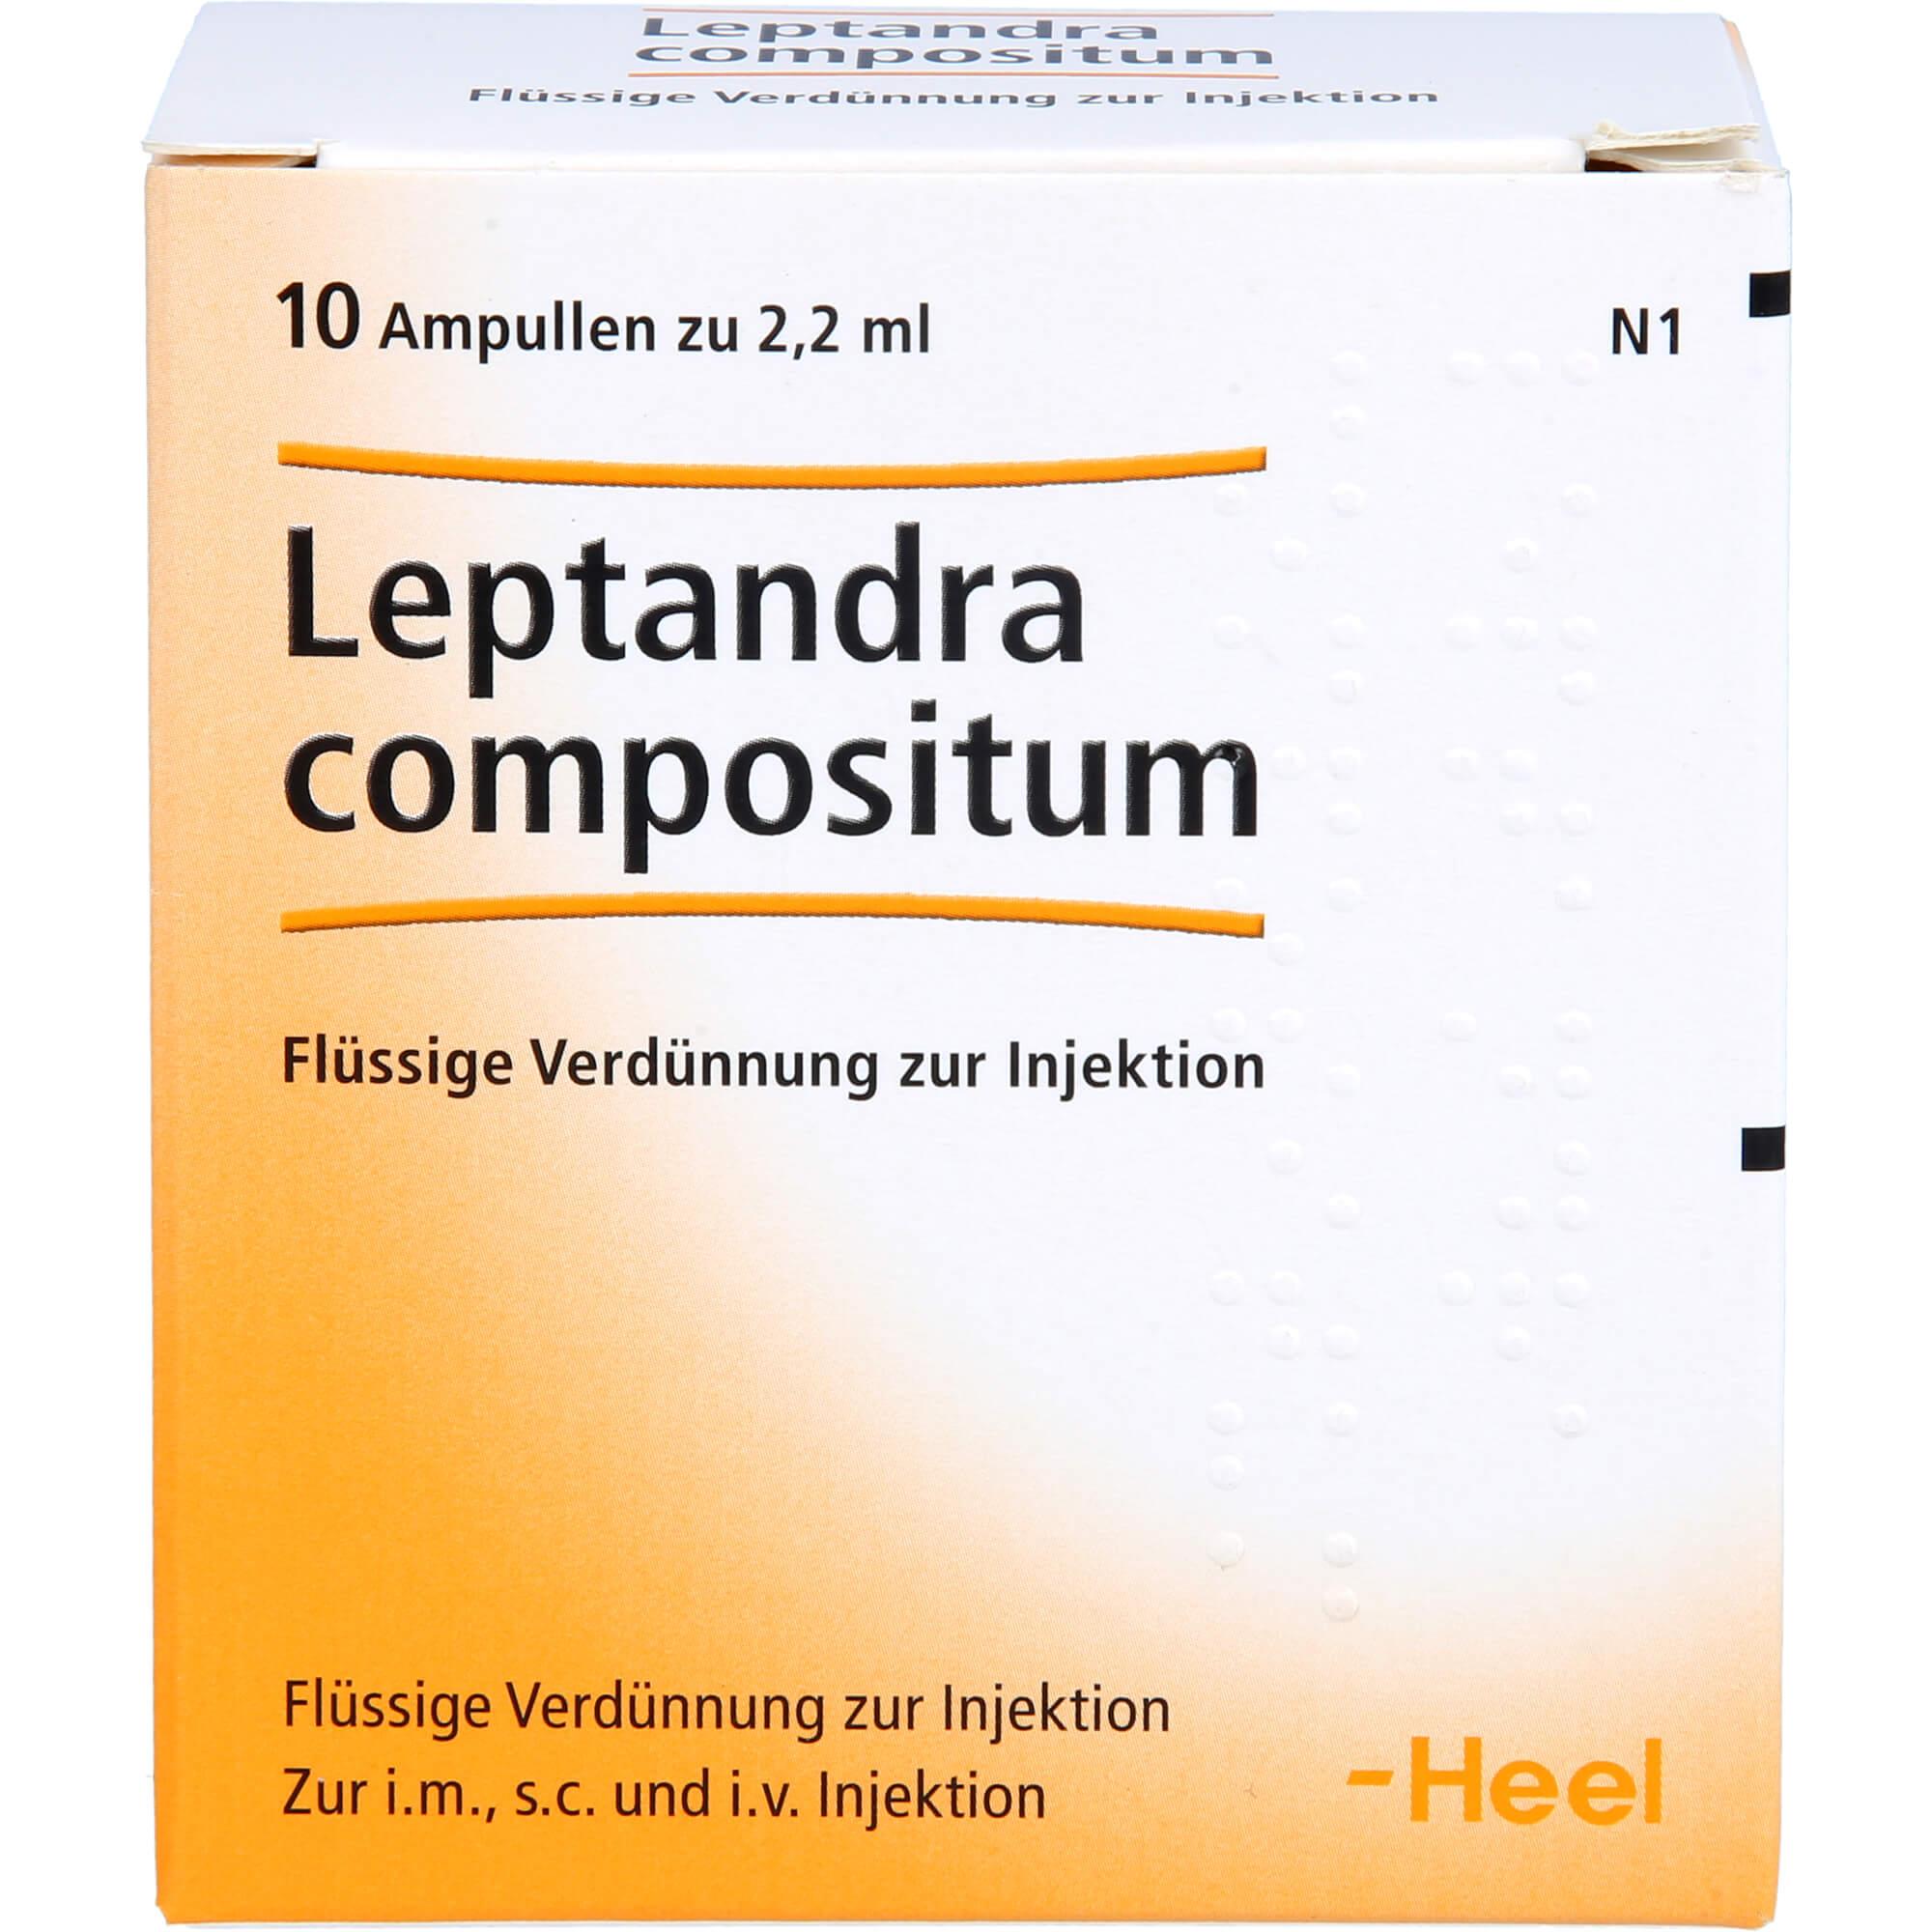 LEPTANDRA COMPOSITUM Ampullen